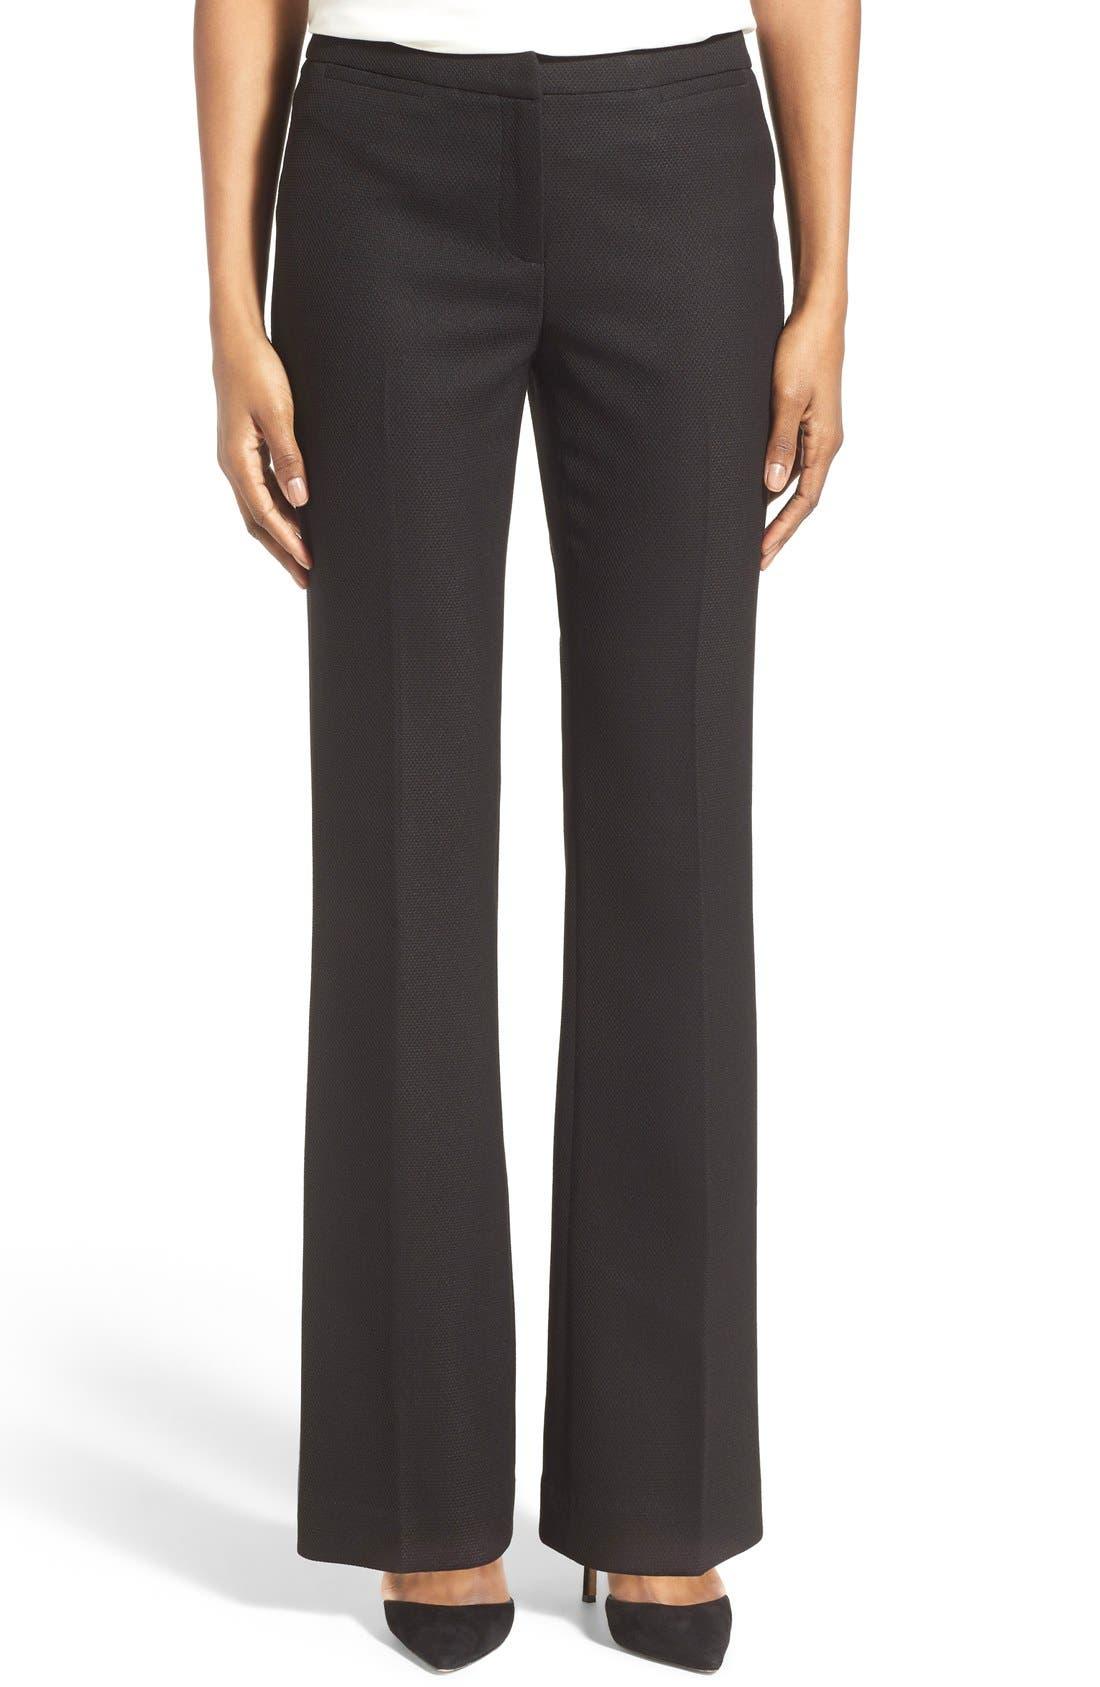 Alternate Image 1 Selected - Halogen® 'Quinn' Diamond Stretch Pants